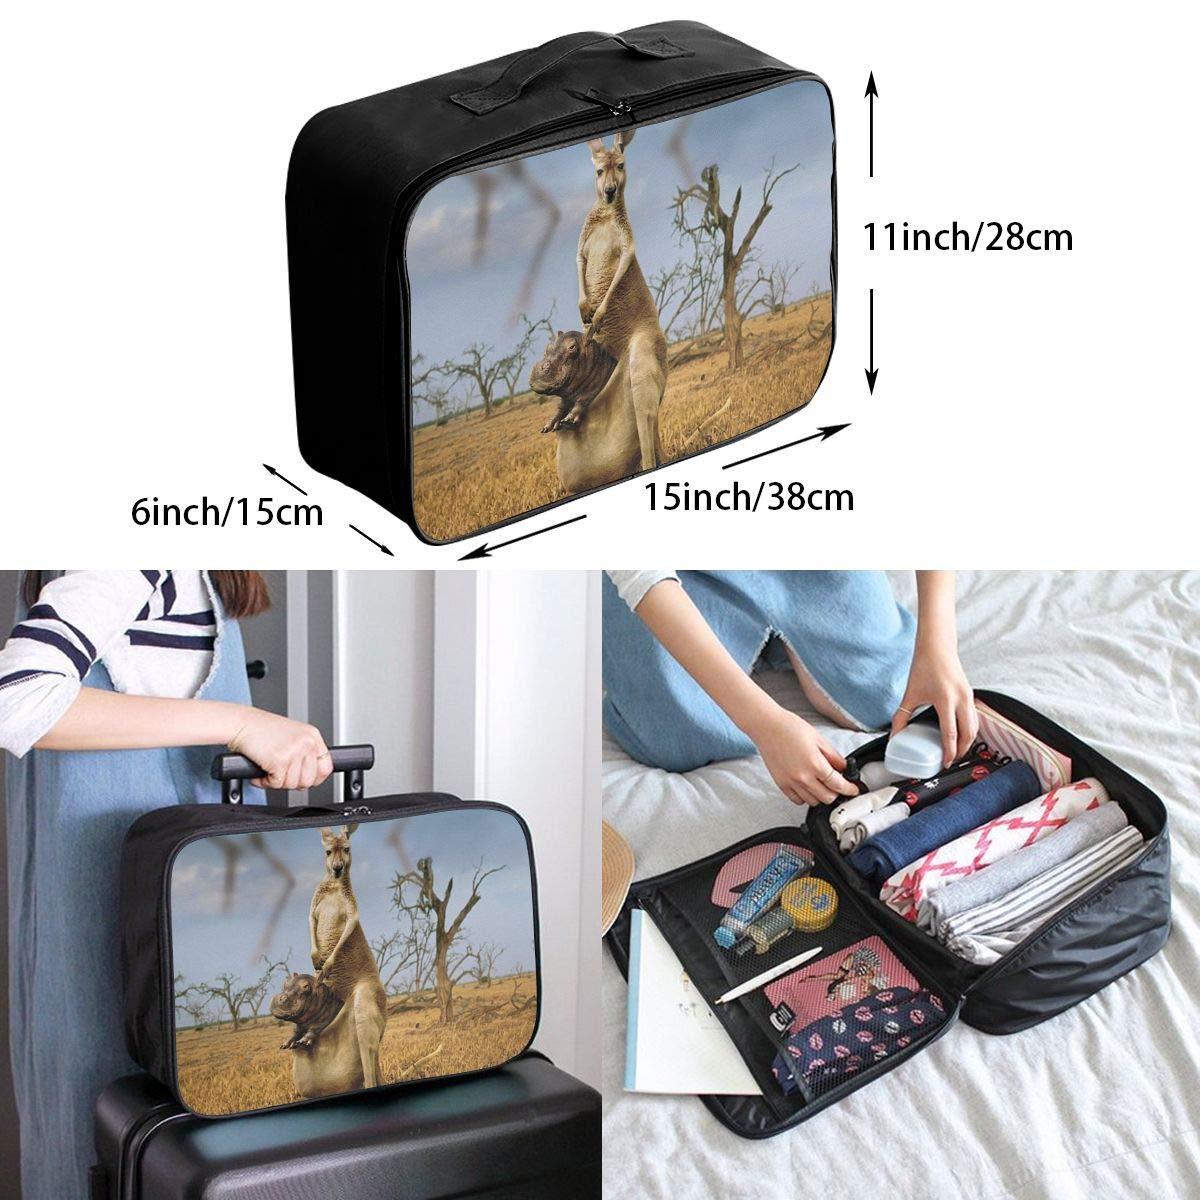 Travel Luggage Duffle Bag Lightweight Portable Handbag Hippo Kangaroo Large Capacity Waterproof Foldable Storage Tote